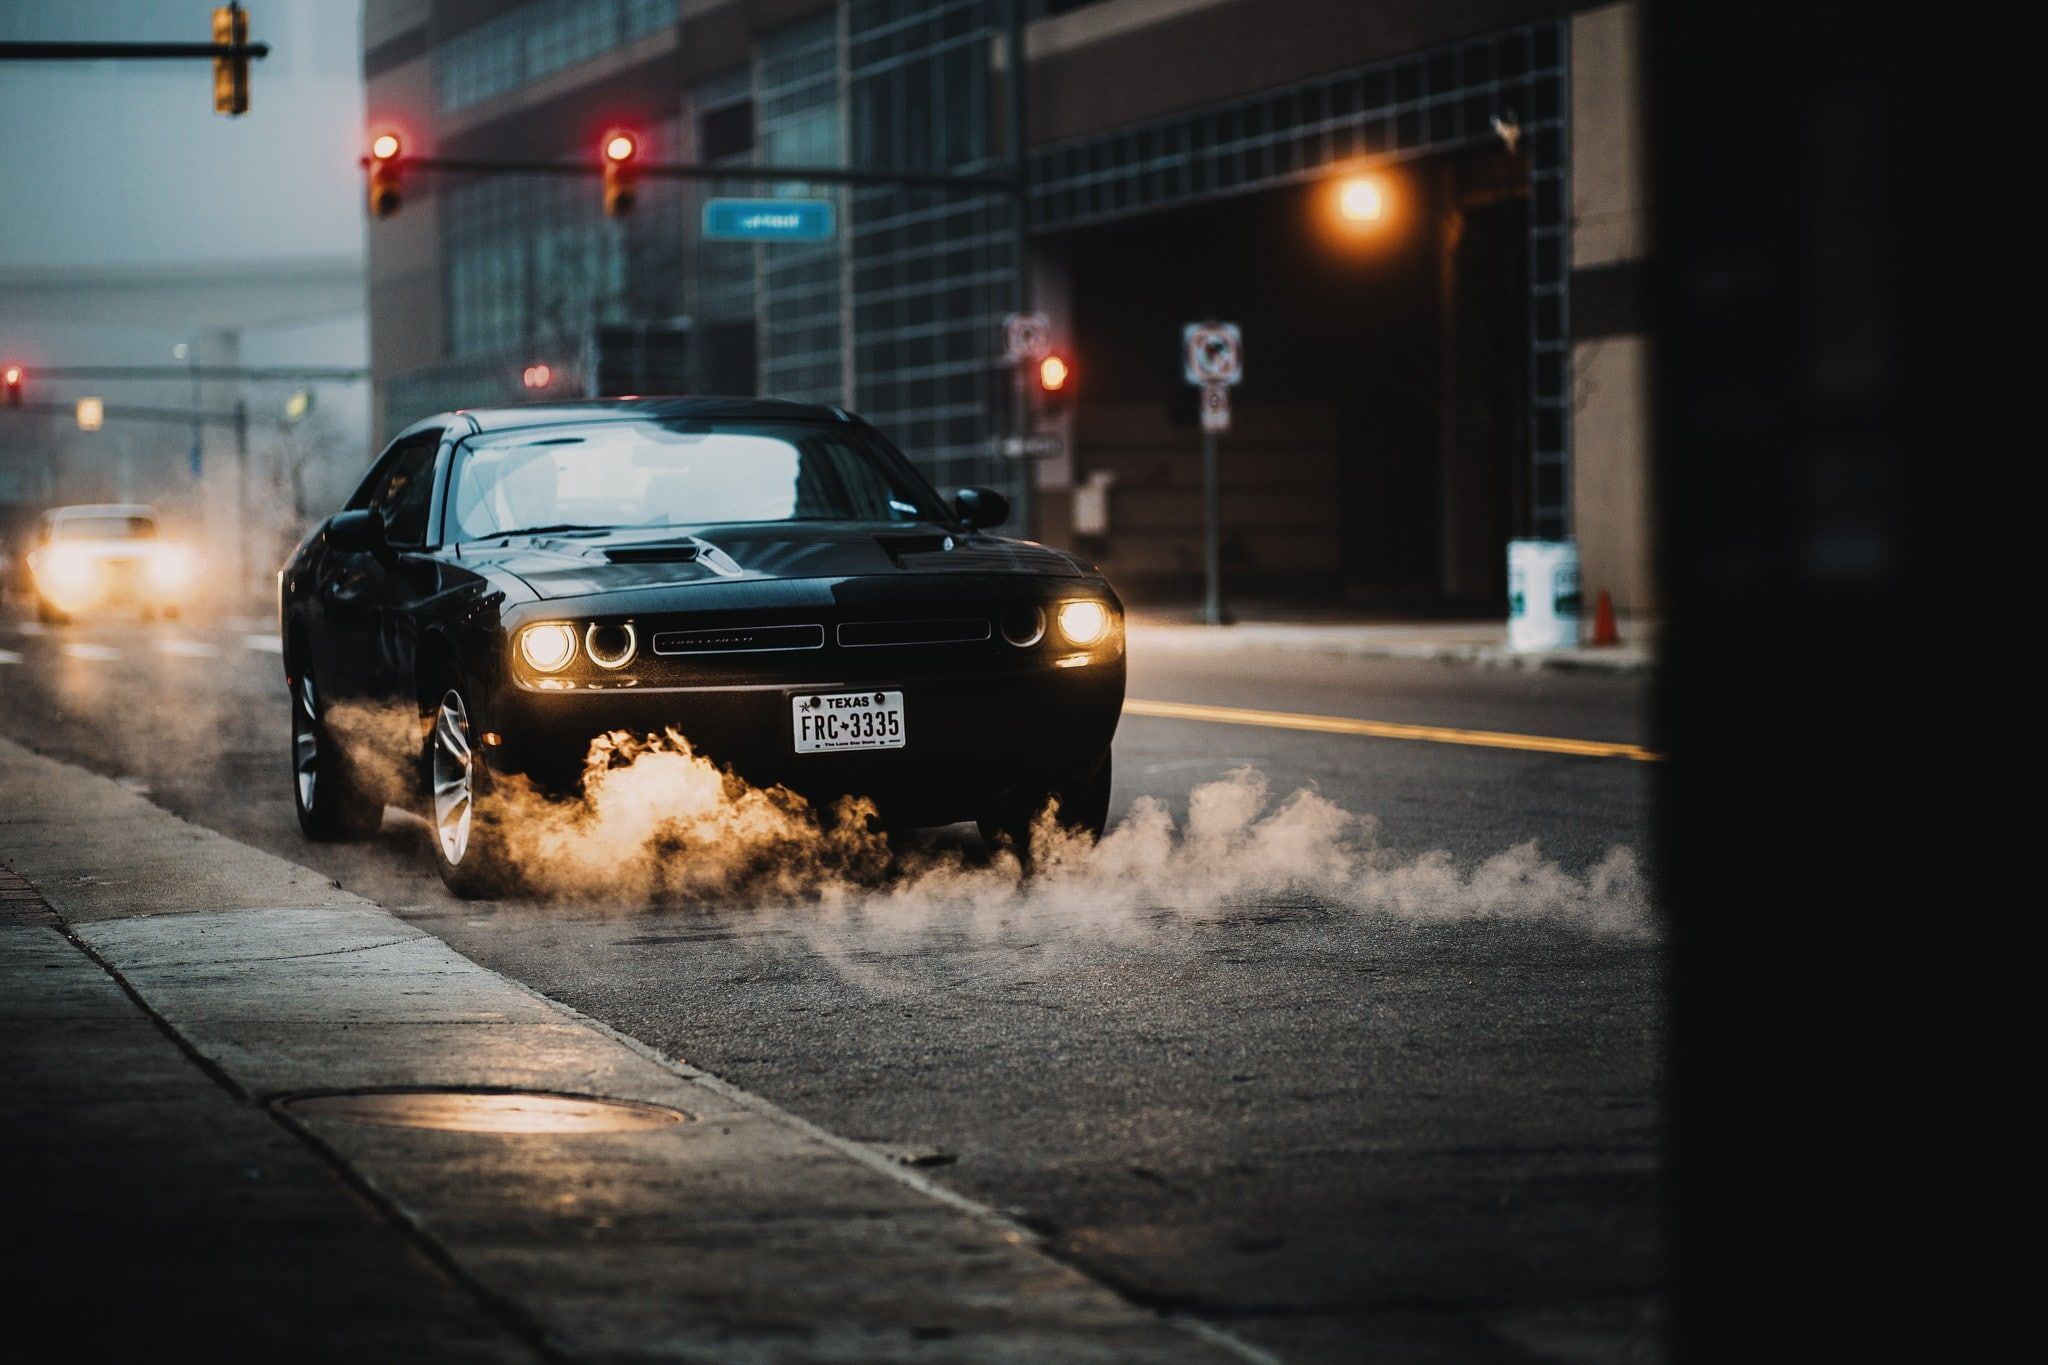 Car Smoke Street Traffic Lights Black Cars Urban 1080p Wallpaper Hdwallpaper Desktop Car Smoke Black Car Traffic Light